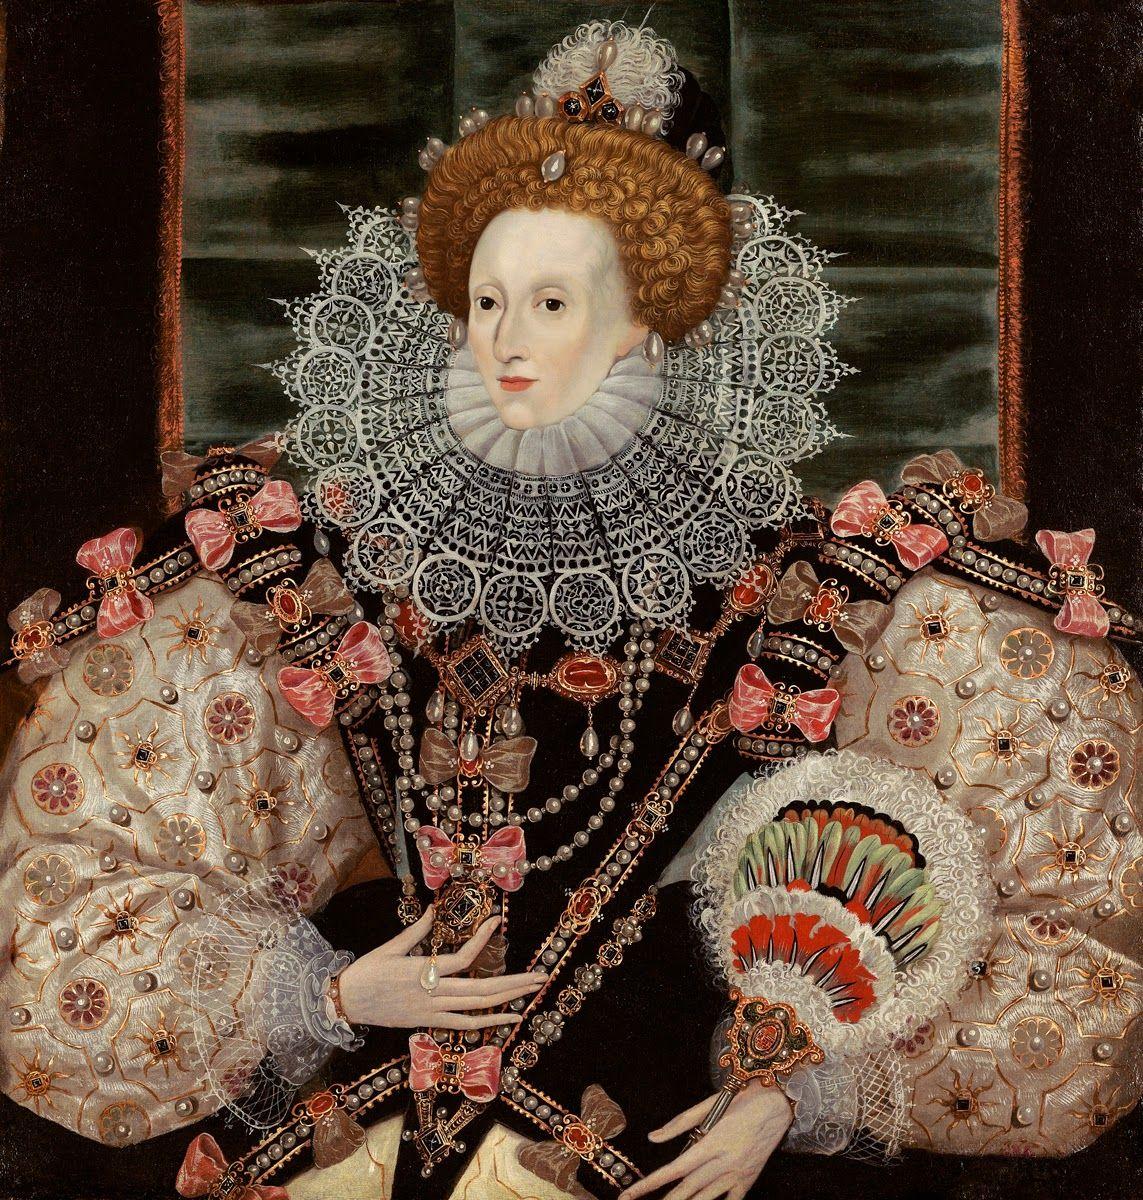 Queen Elizabeth I Elizabeth i, Queen elizabeth